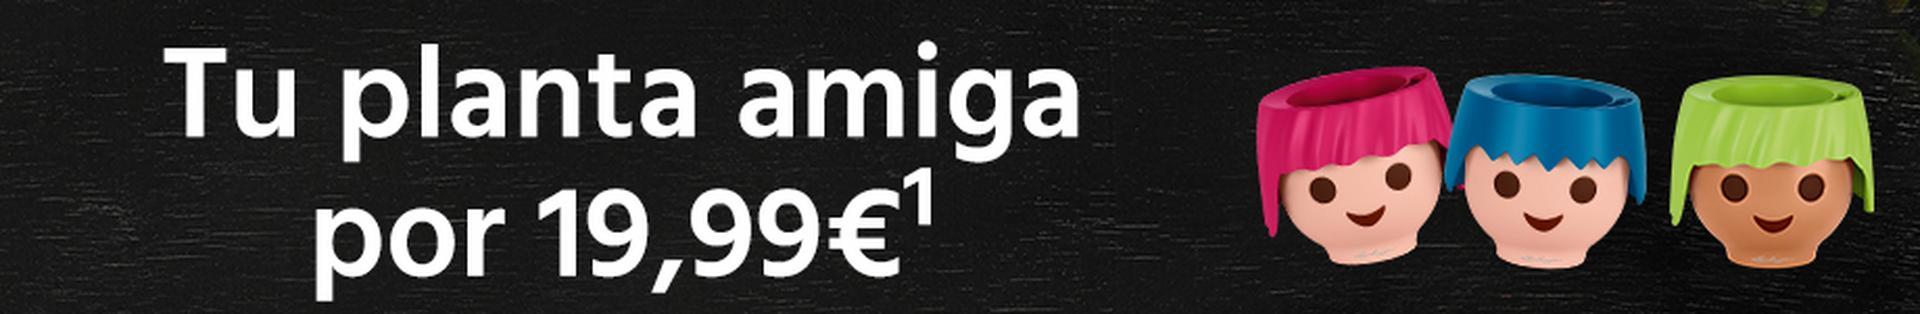 le_listing_banner_promo_ojo_062020_xs_es